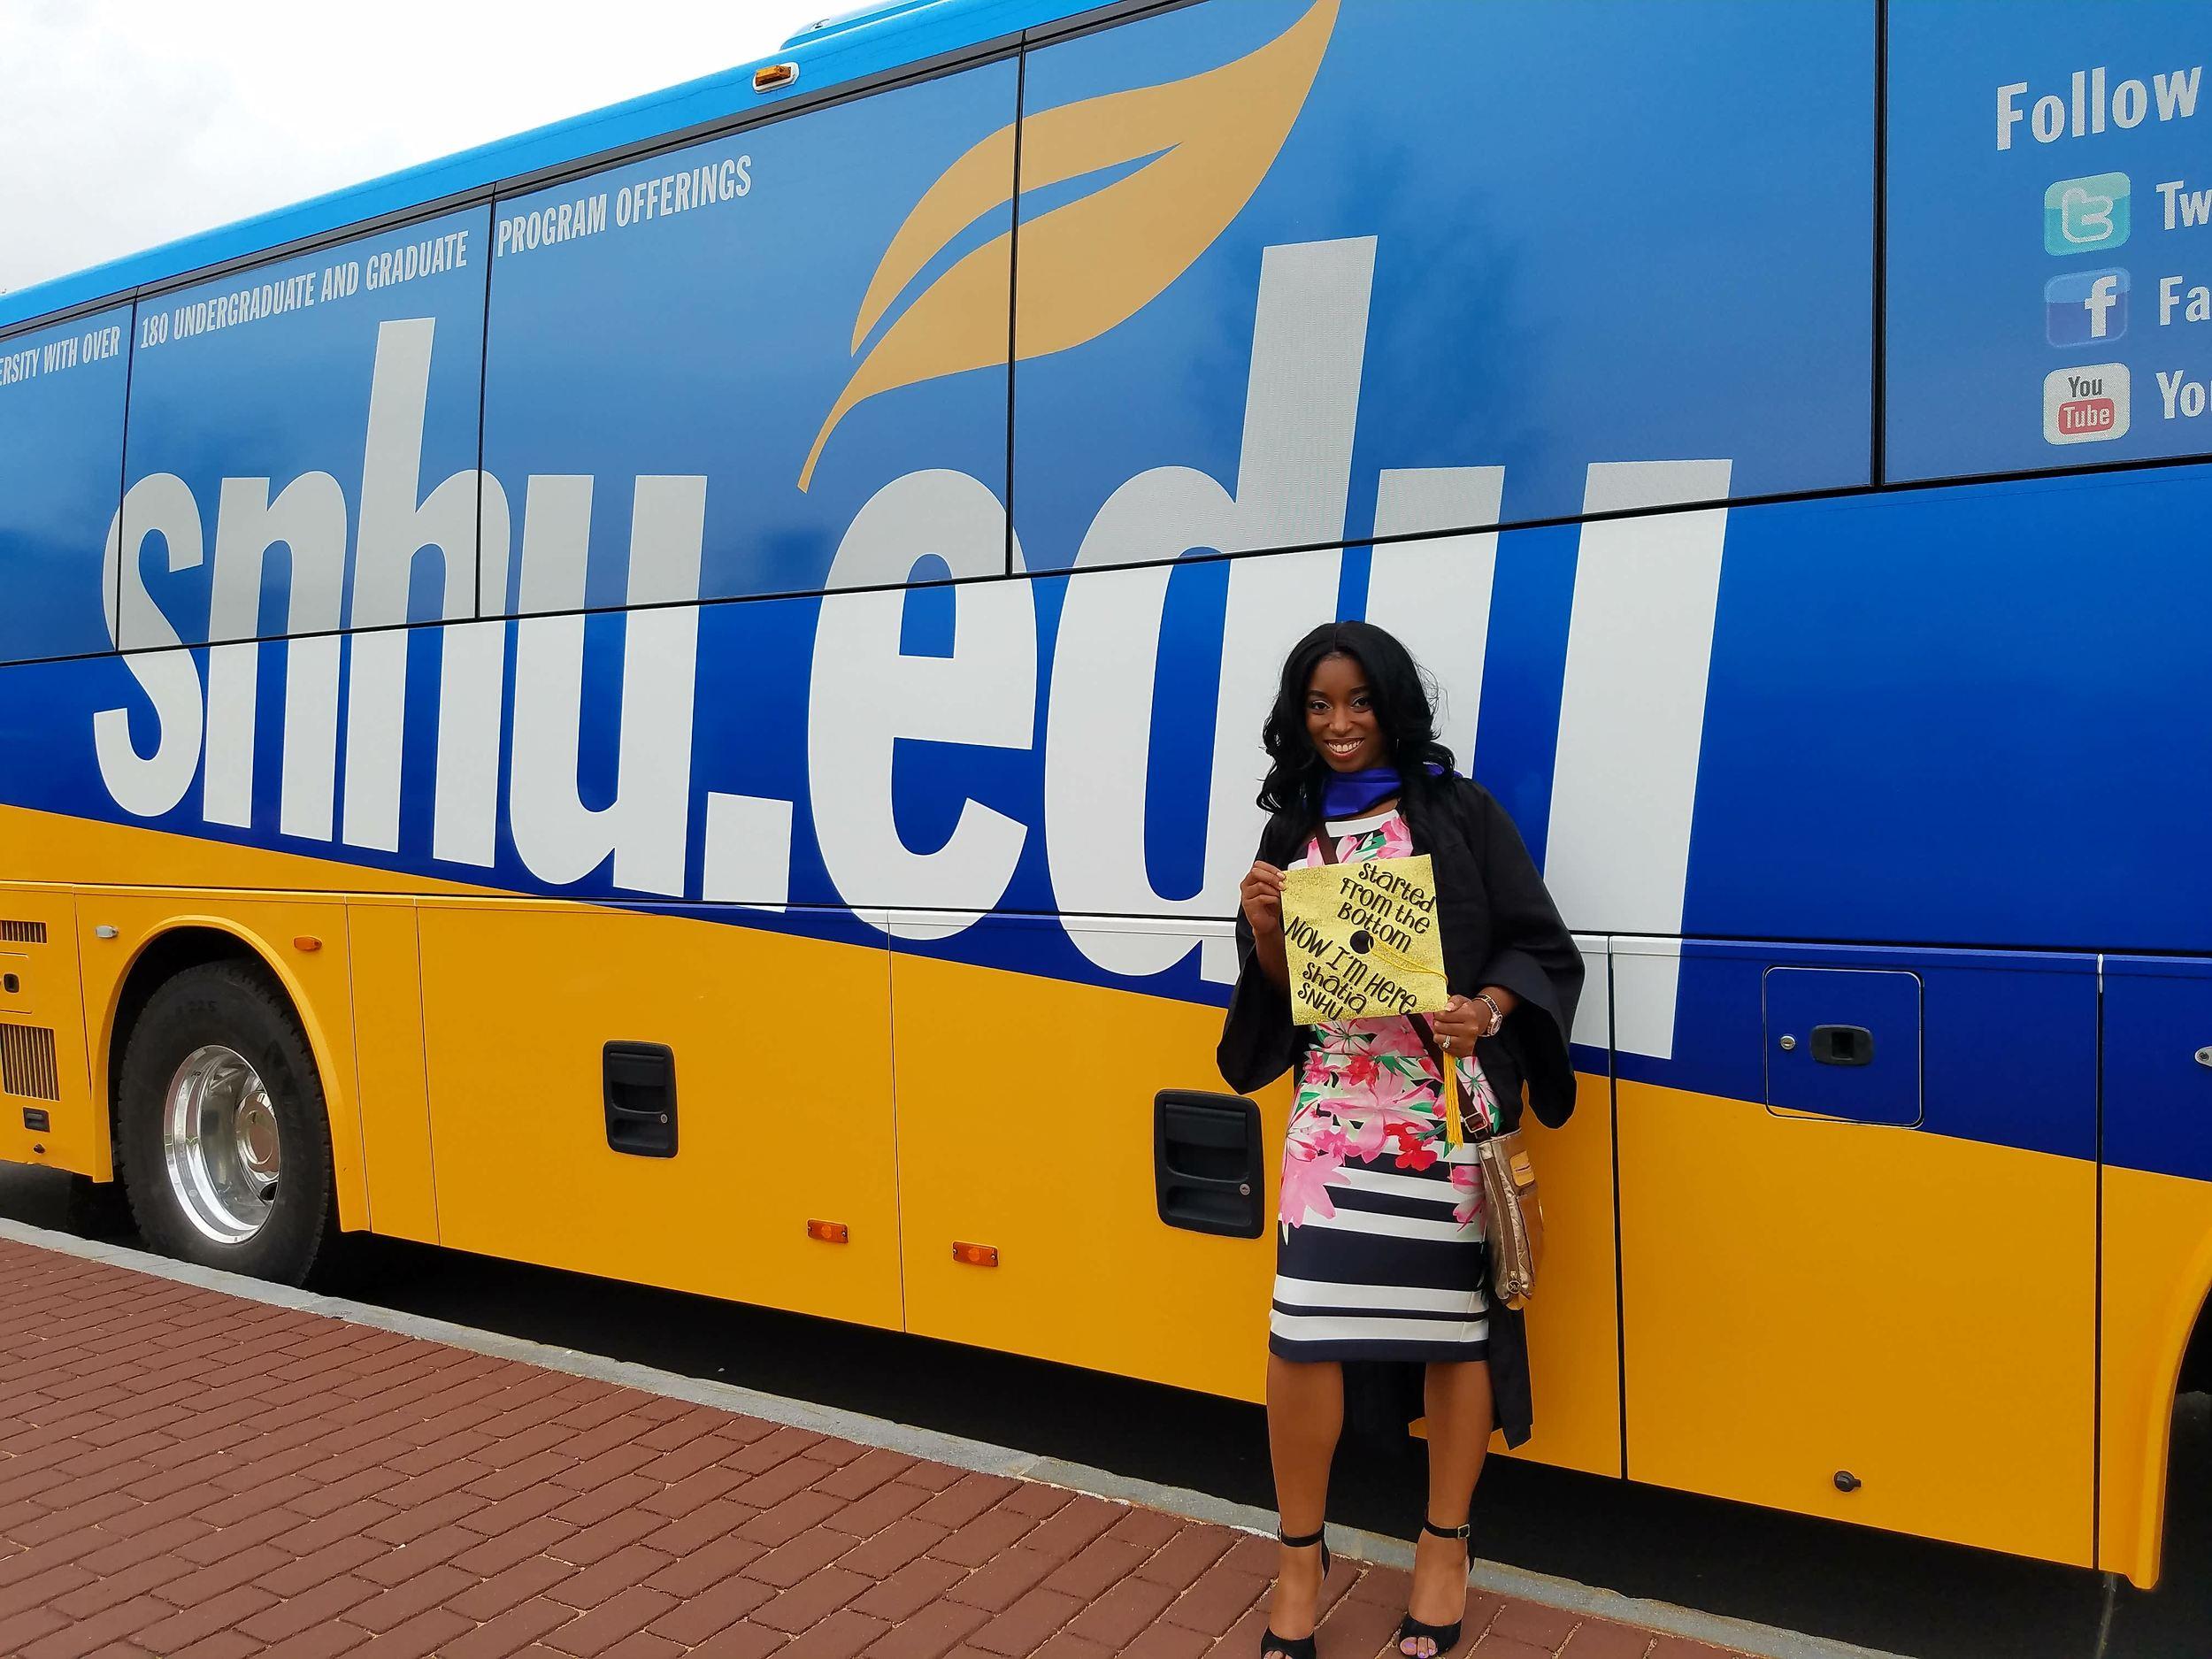 The SNHU Bus!